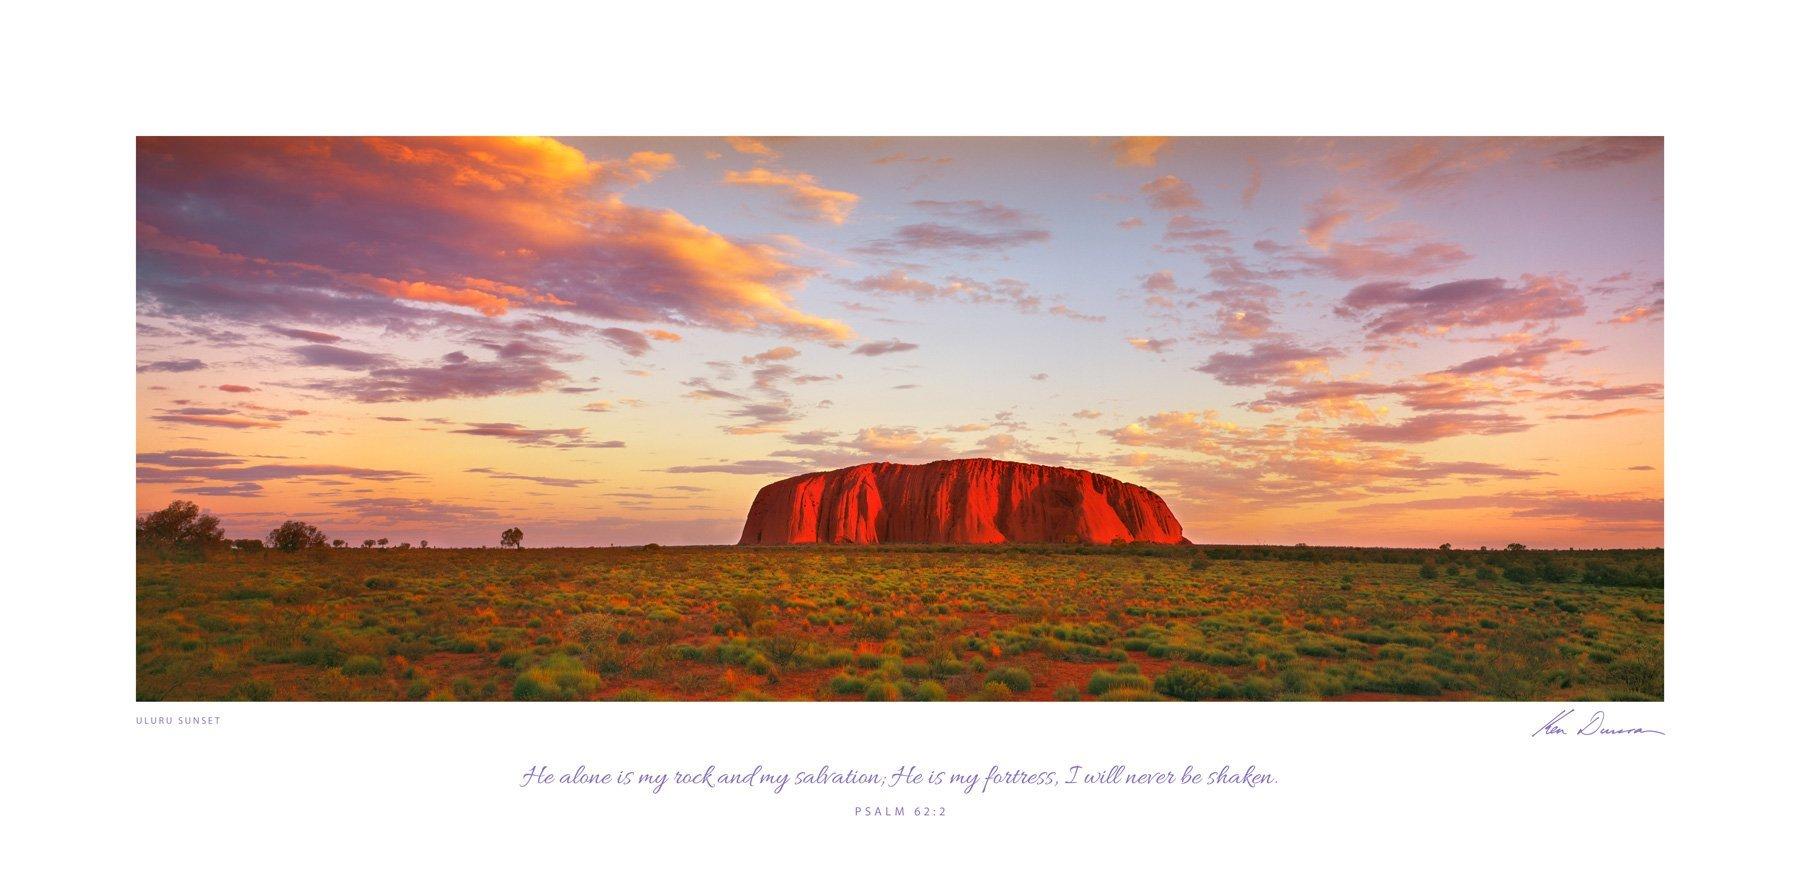 Uluru Sunset (Bible Verse)